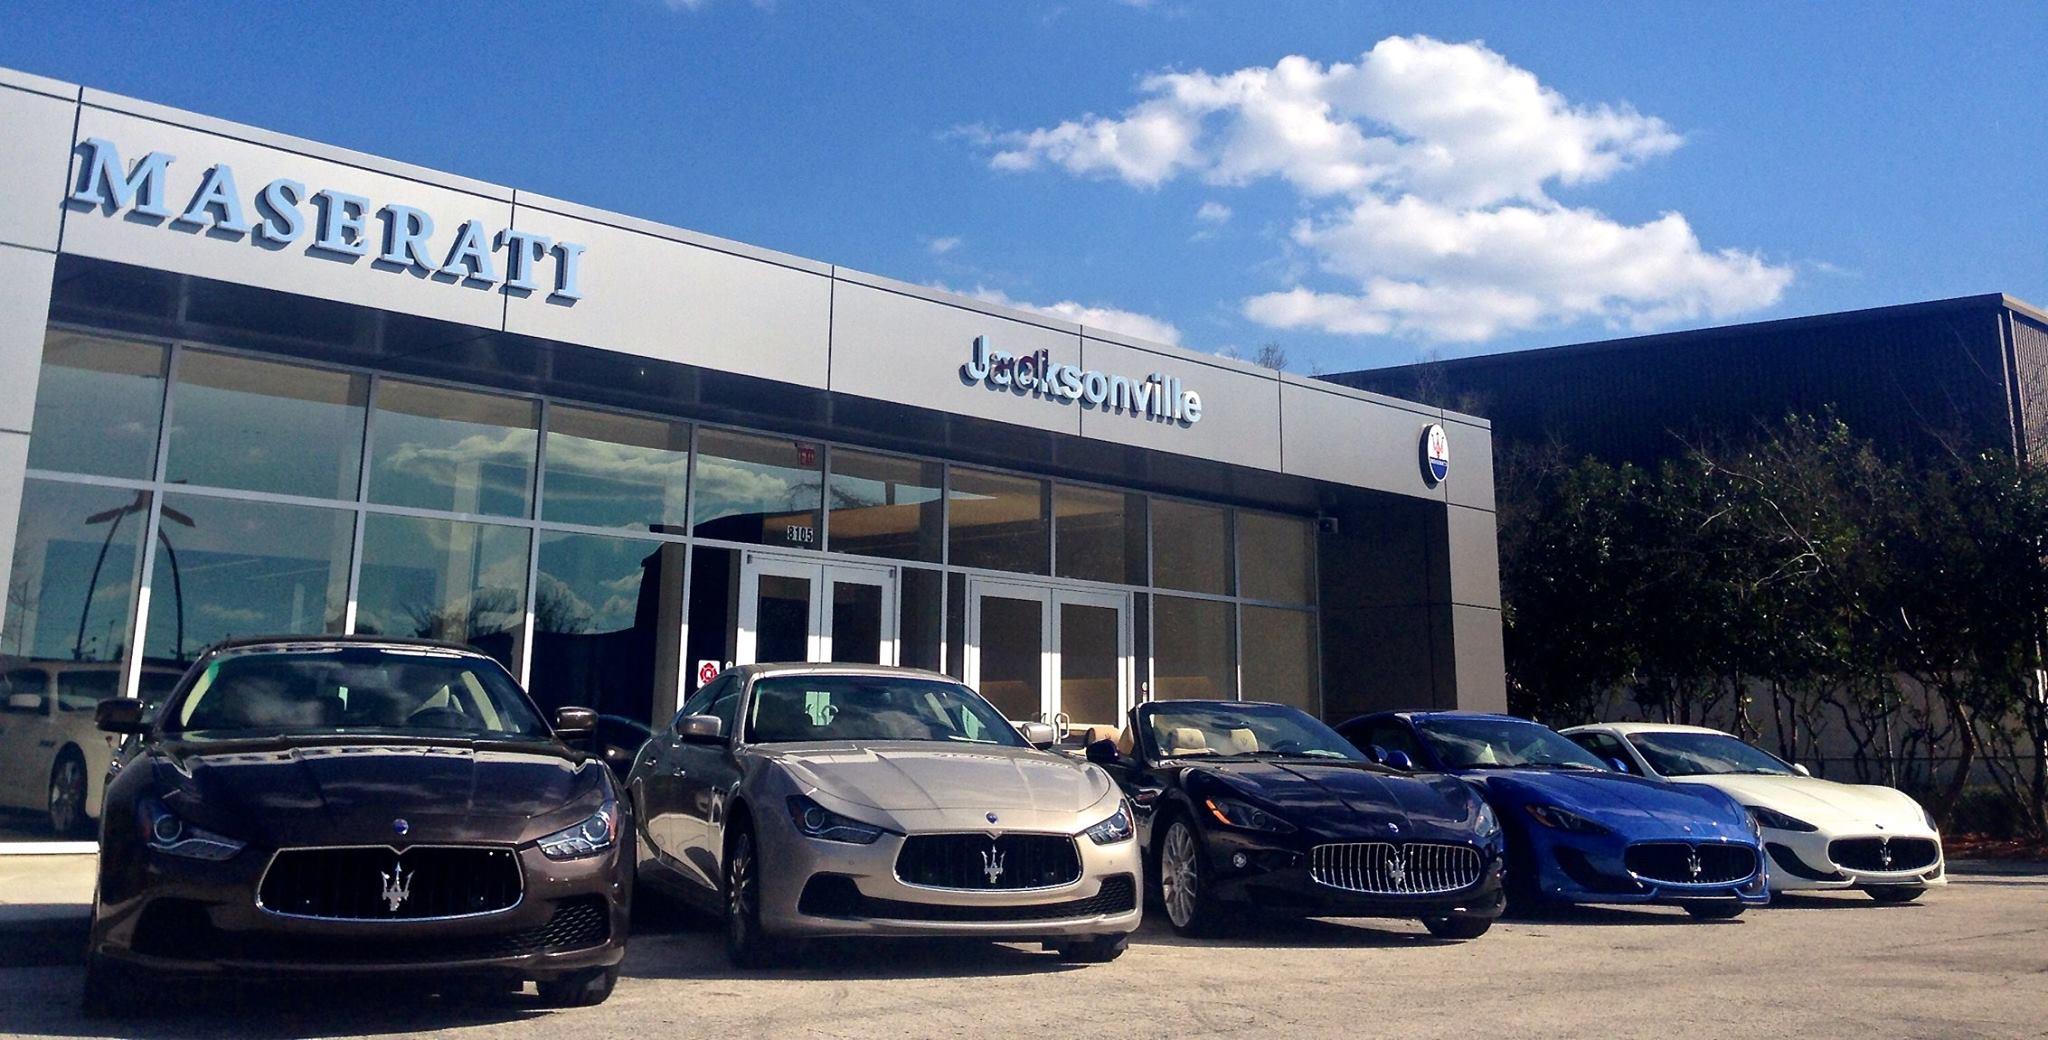 About Maserati Of Jacksonville FL New Luxury Maserati Dealership - Maserati car dealership